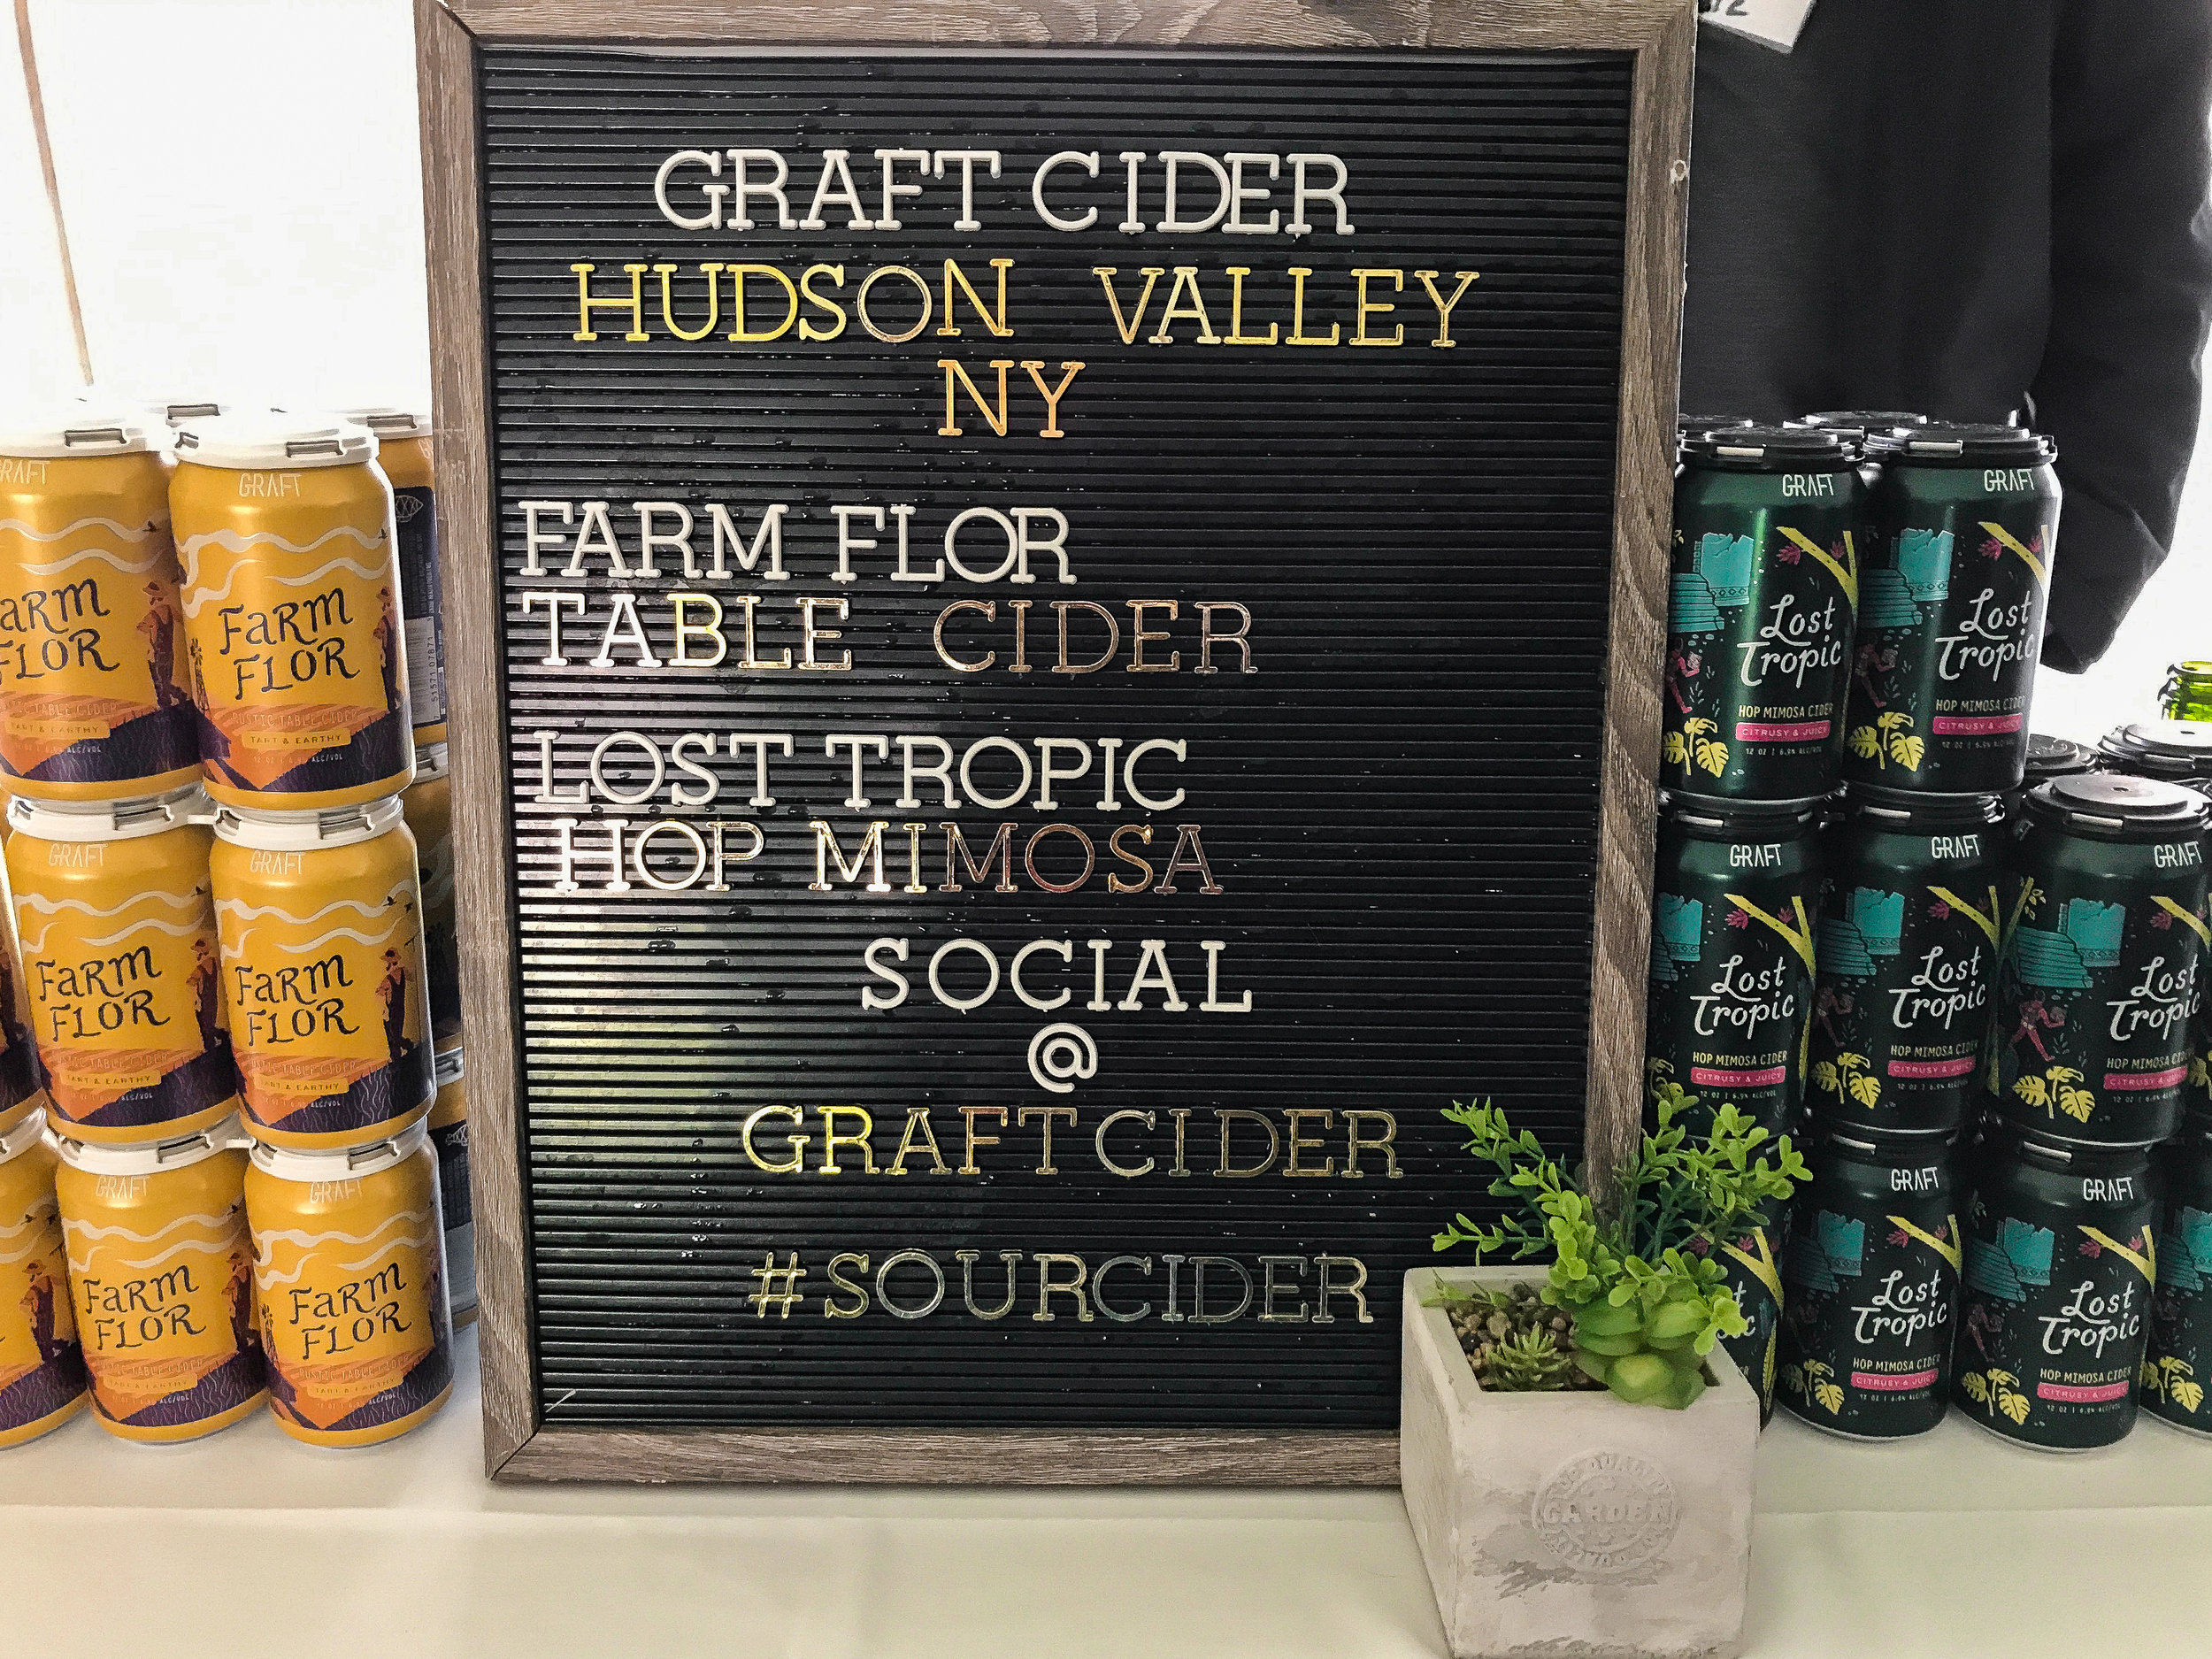 Graft Cider's table